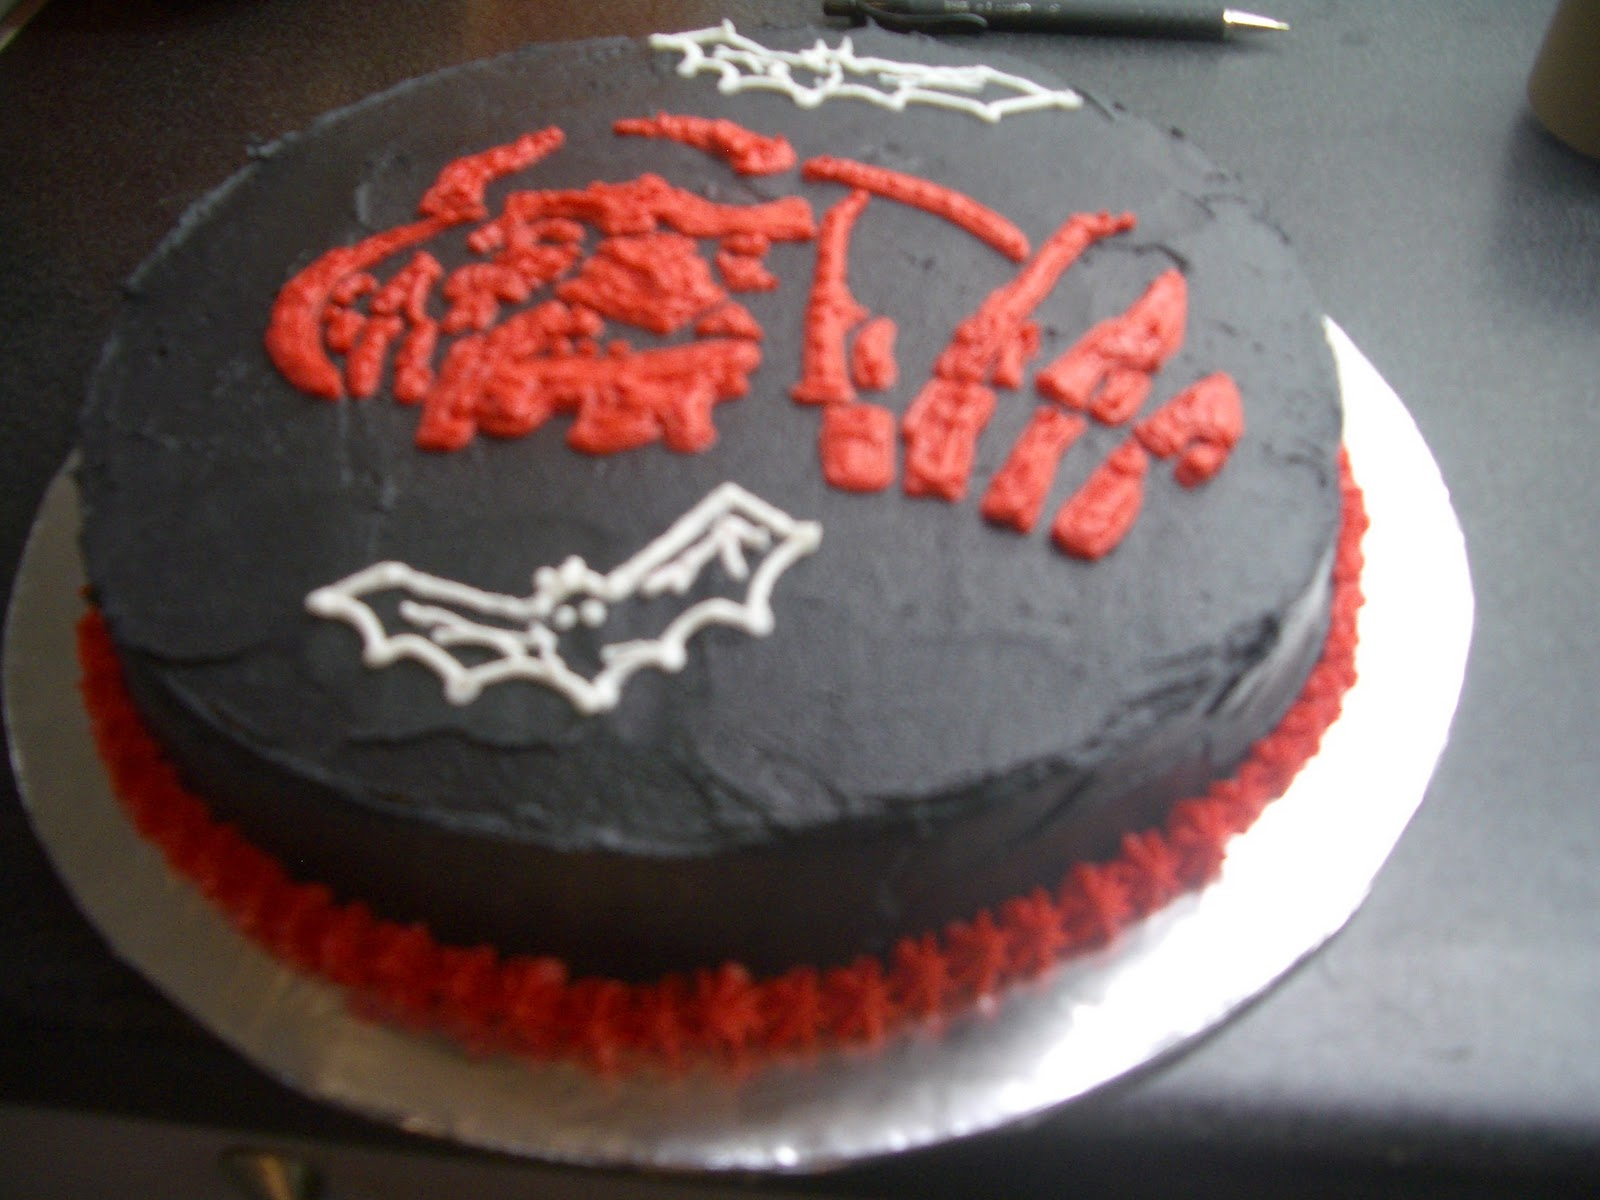 Baby Cakes A Freddy Krueger Birthday